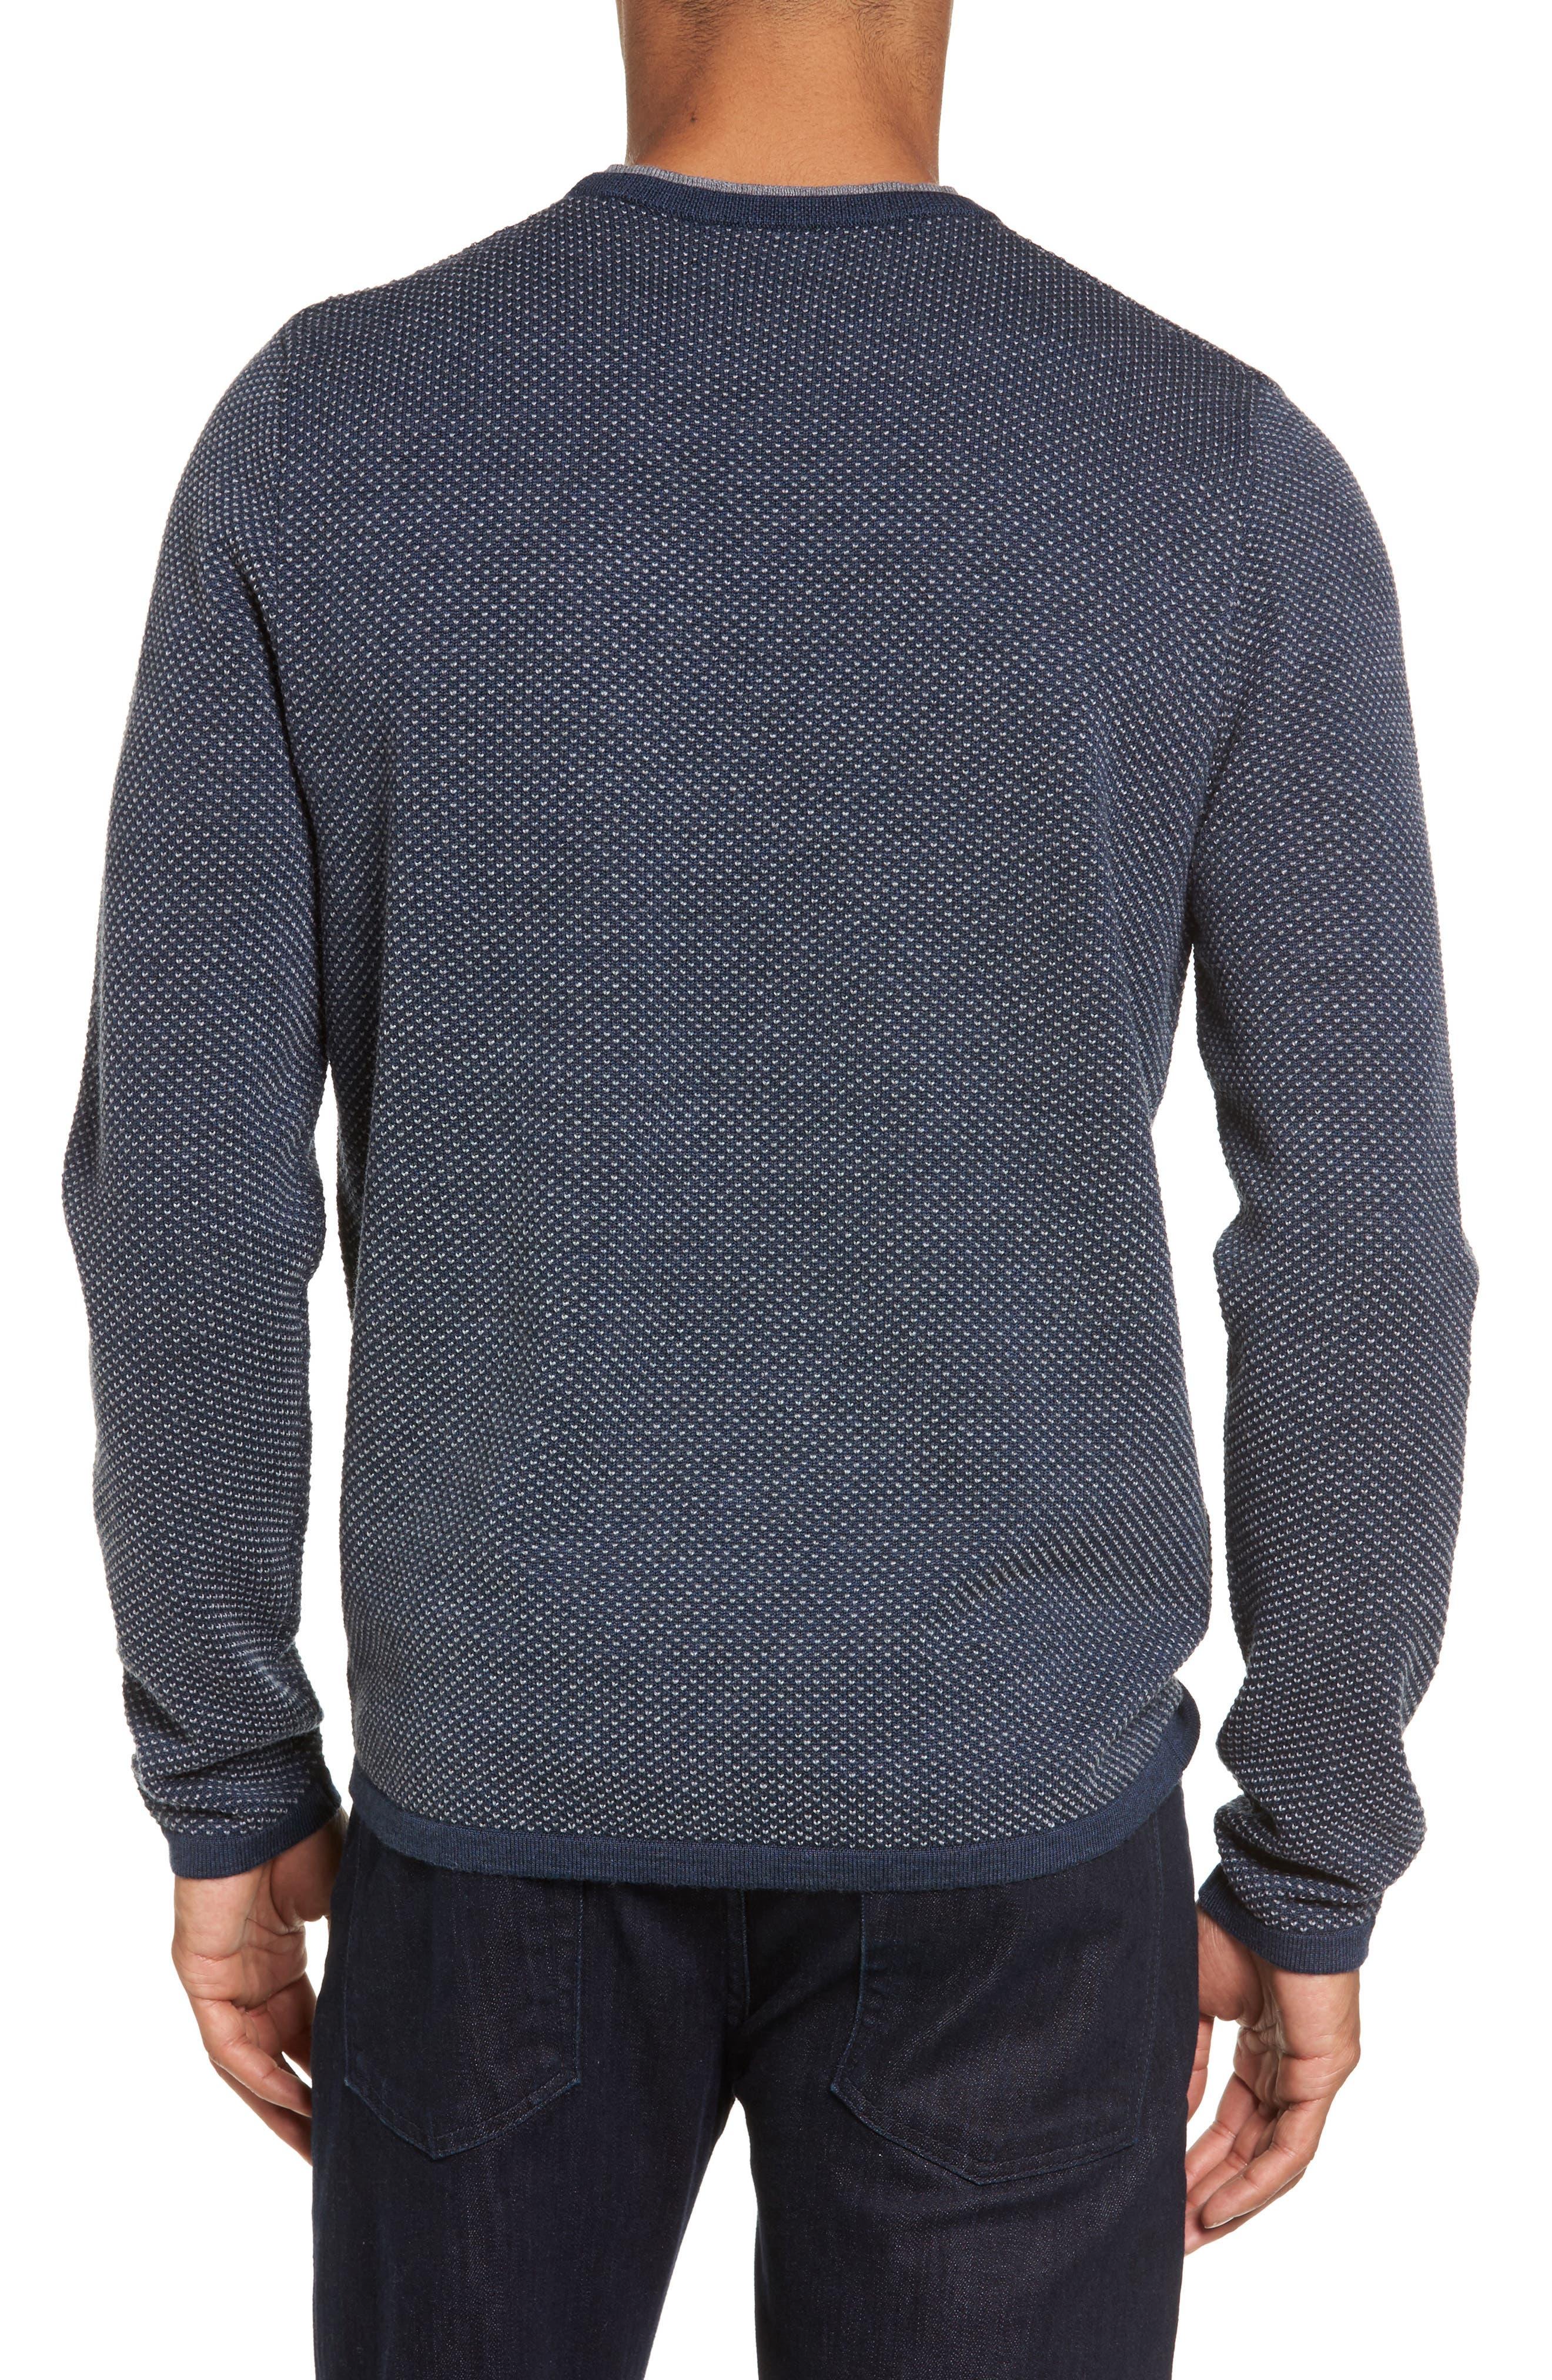 Alternate Image 2  - Nordstrom Men's Shop Crewneck Knit Sweater (Tall)